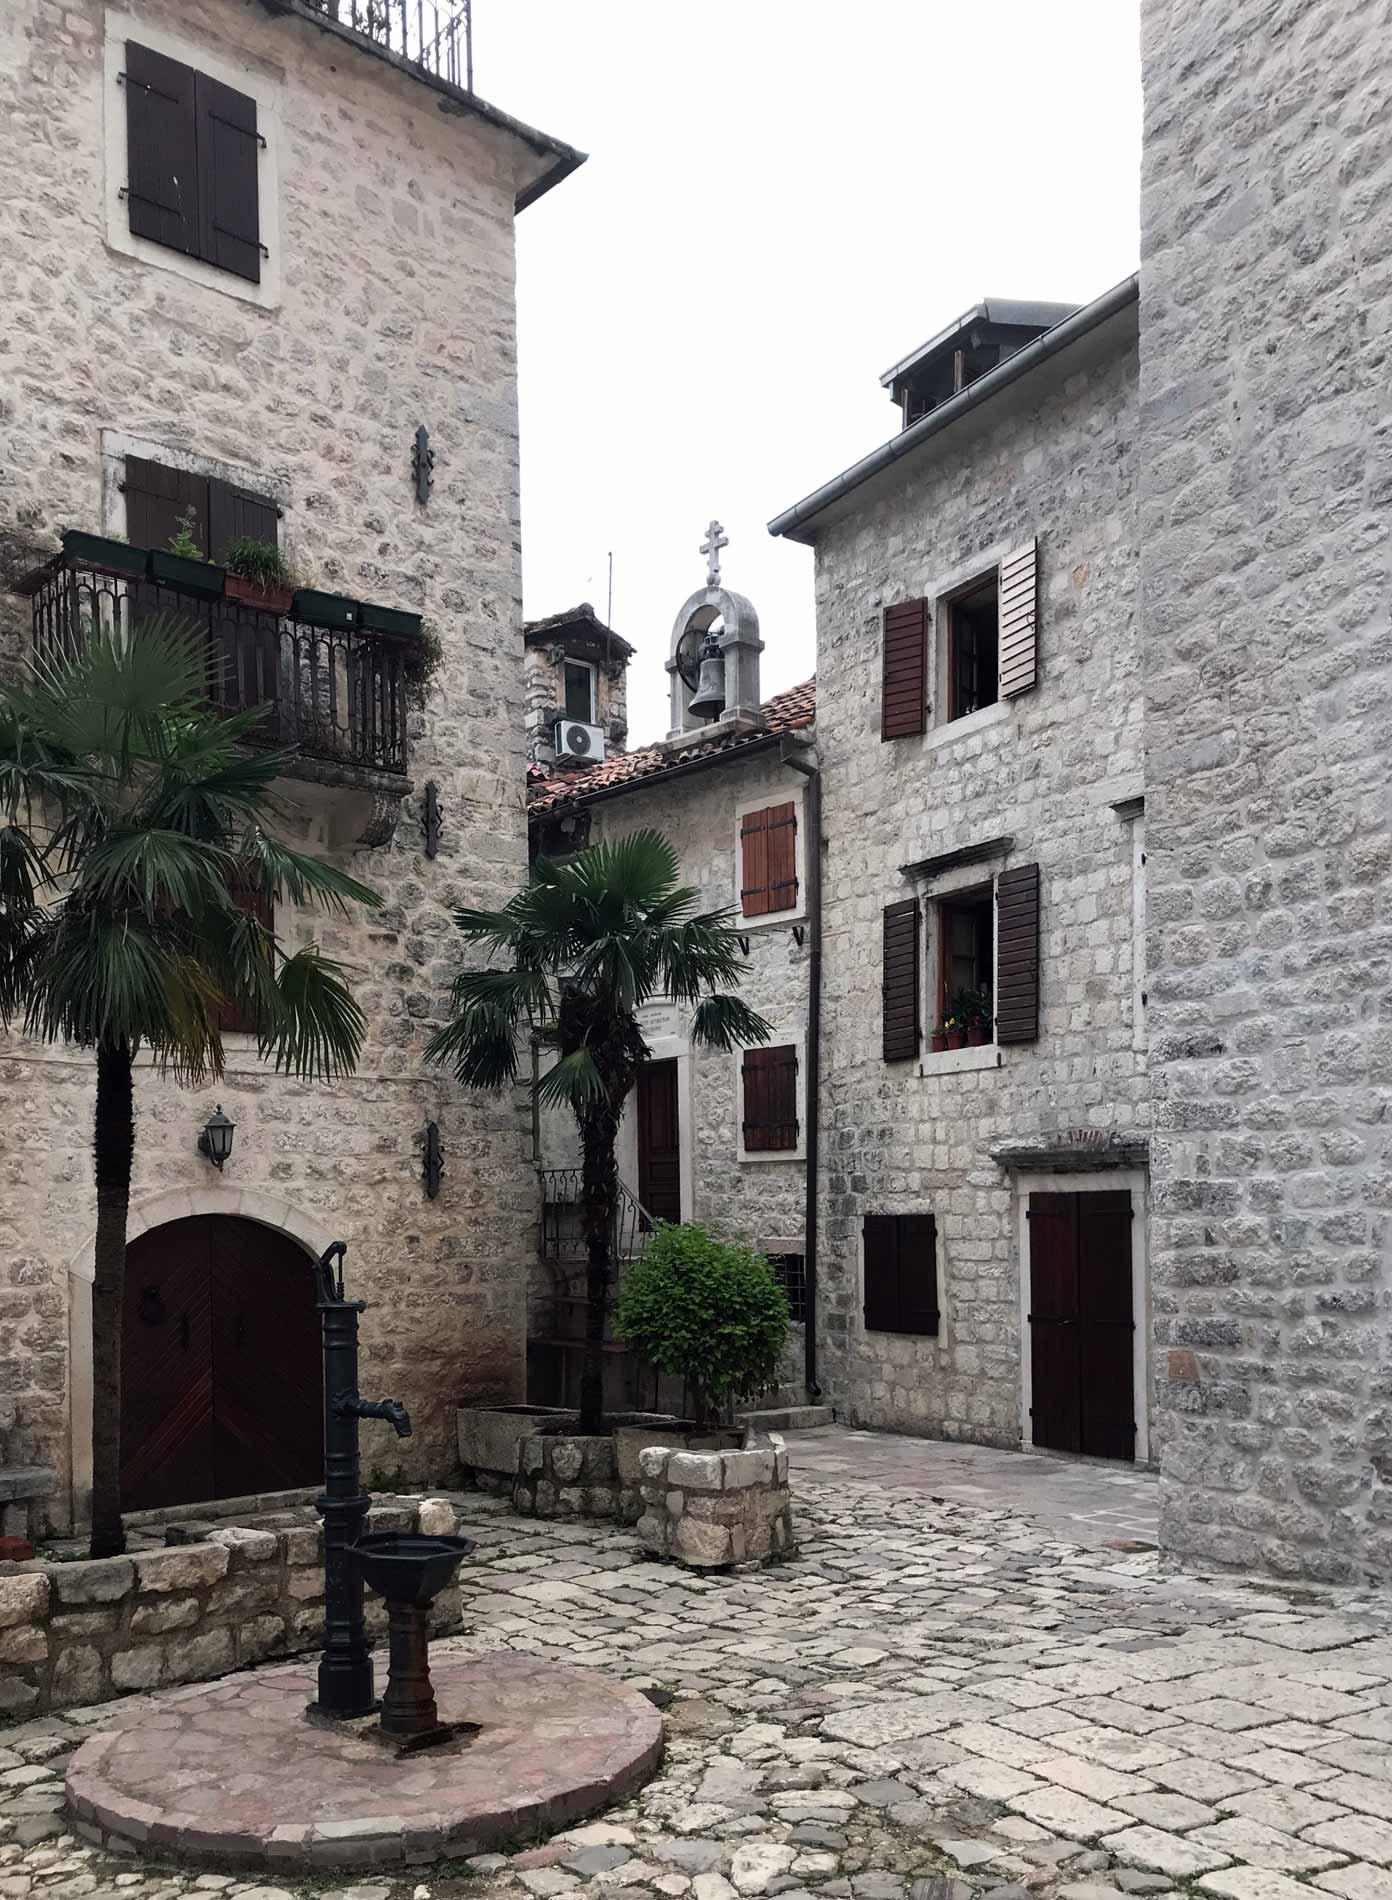 Kotor-Montenegro-via-Ulica-2-case-fontanella-muri-in-pietra